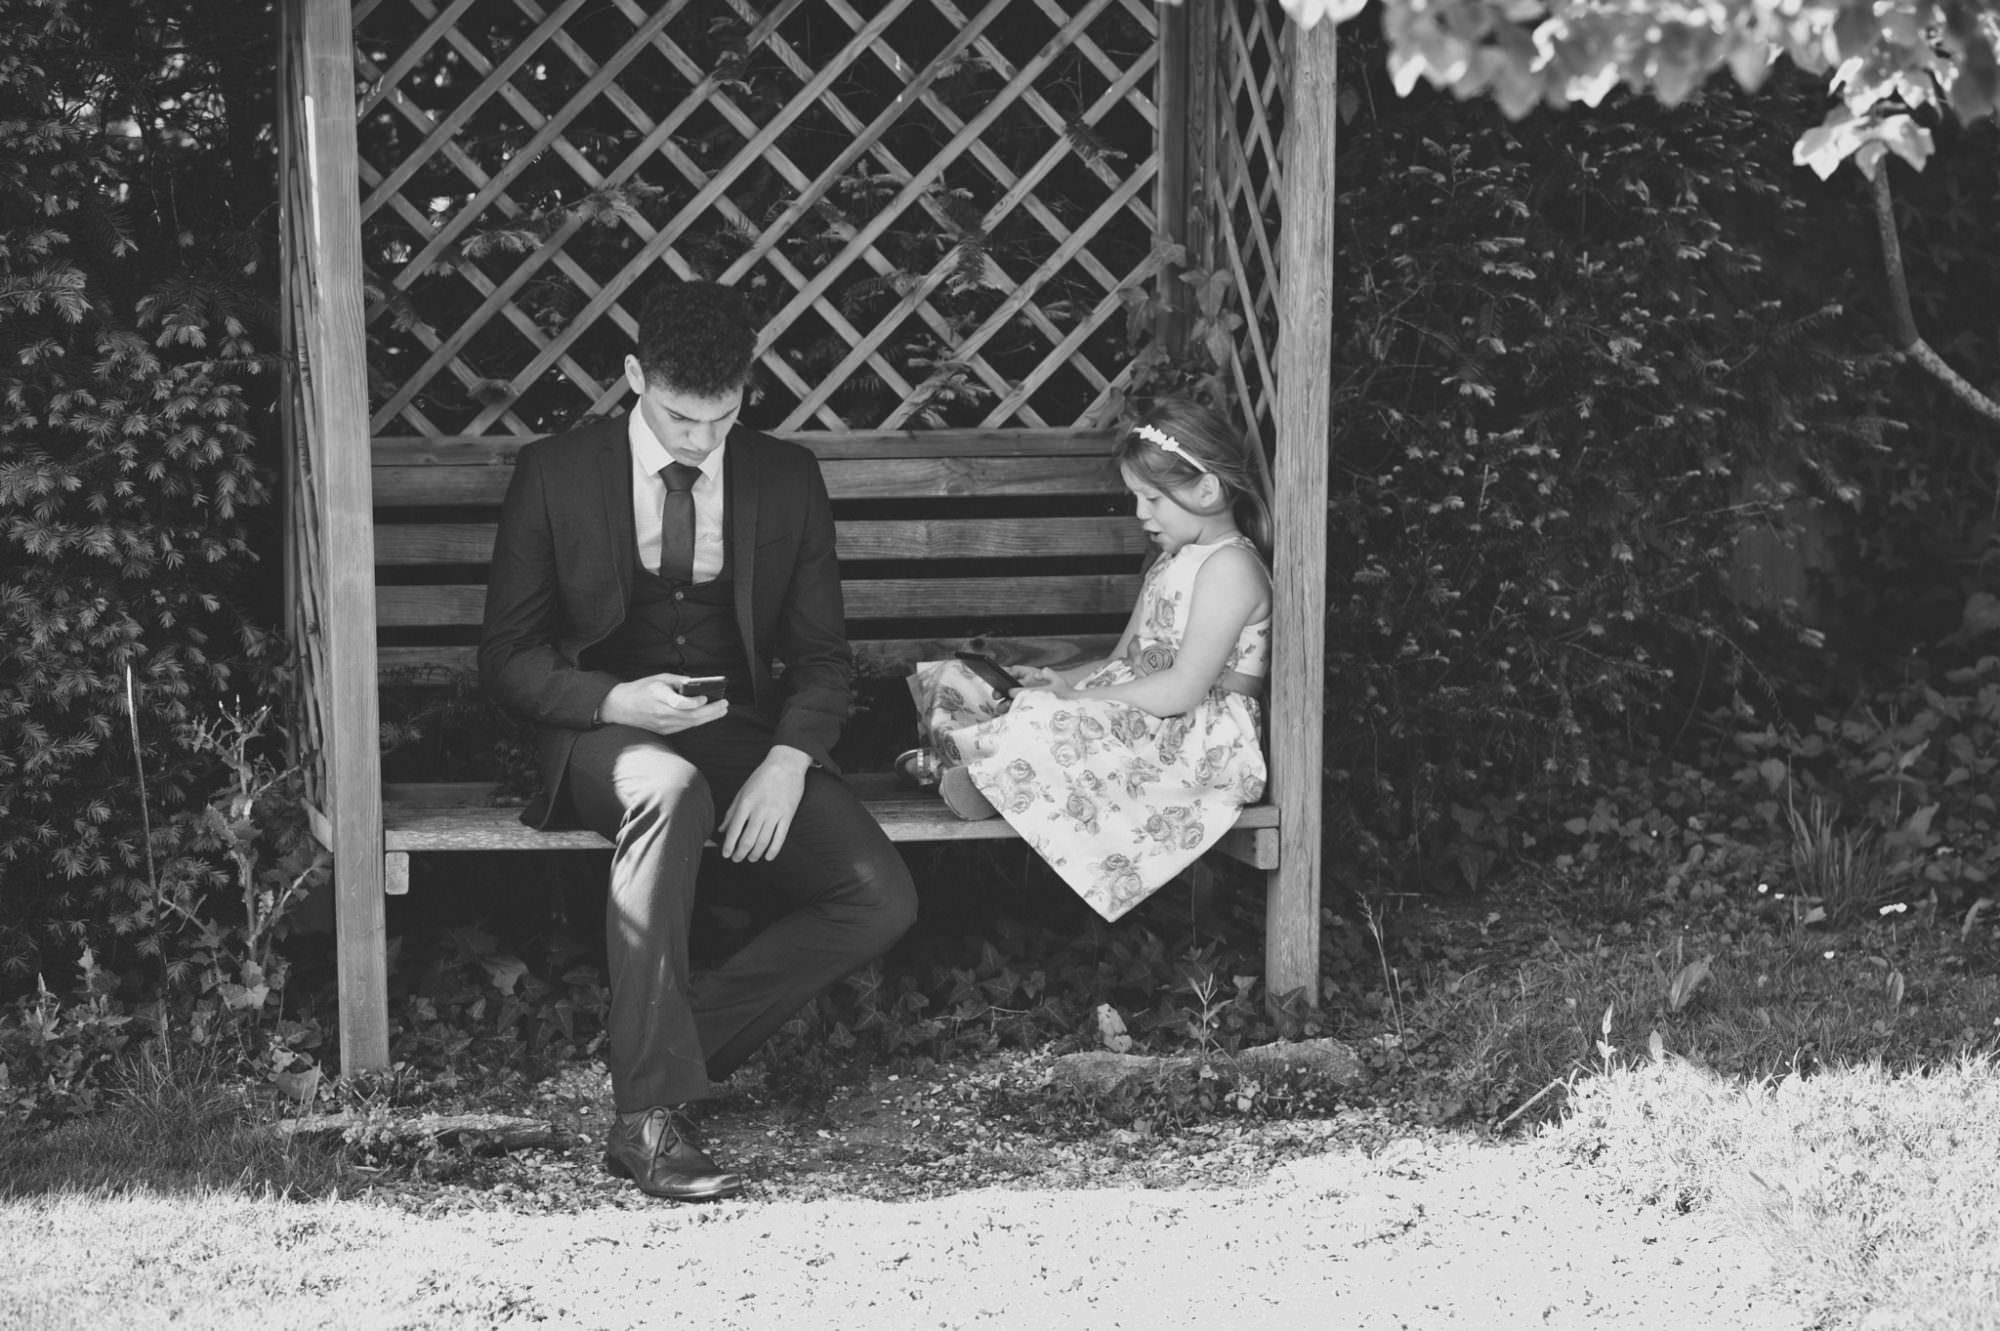 Black and white hampshire photograph